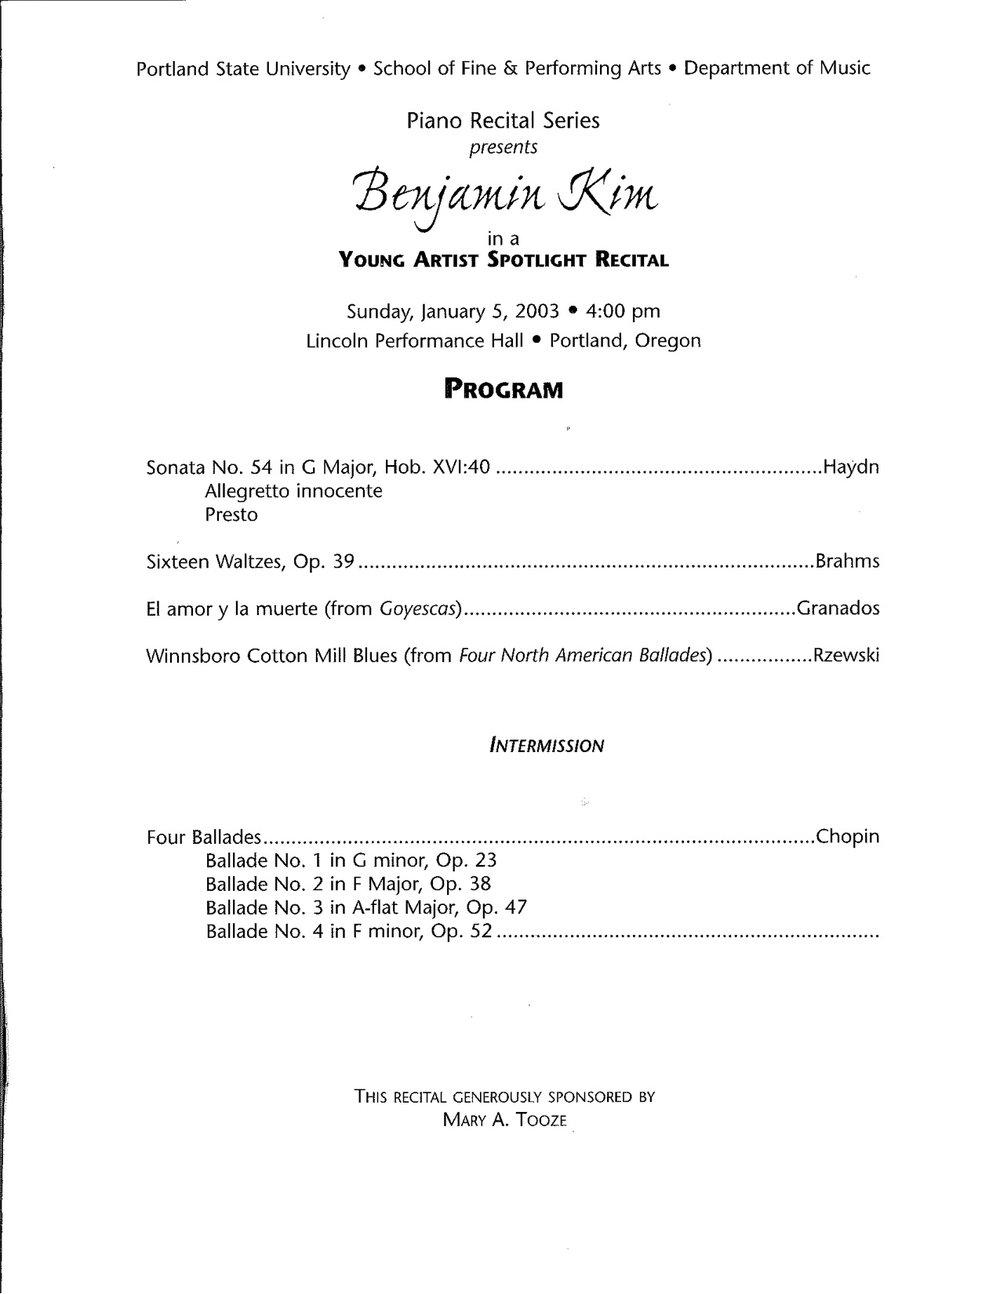 Kim02-03_Program2.jpg